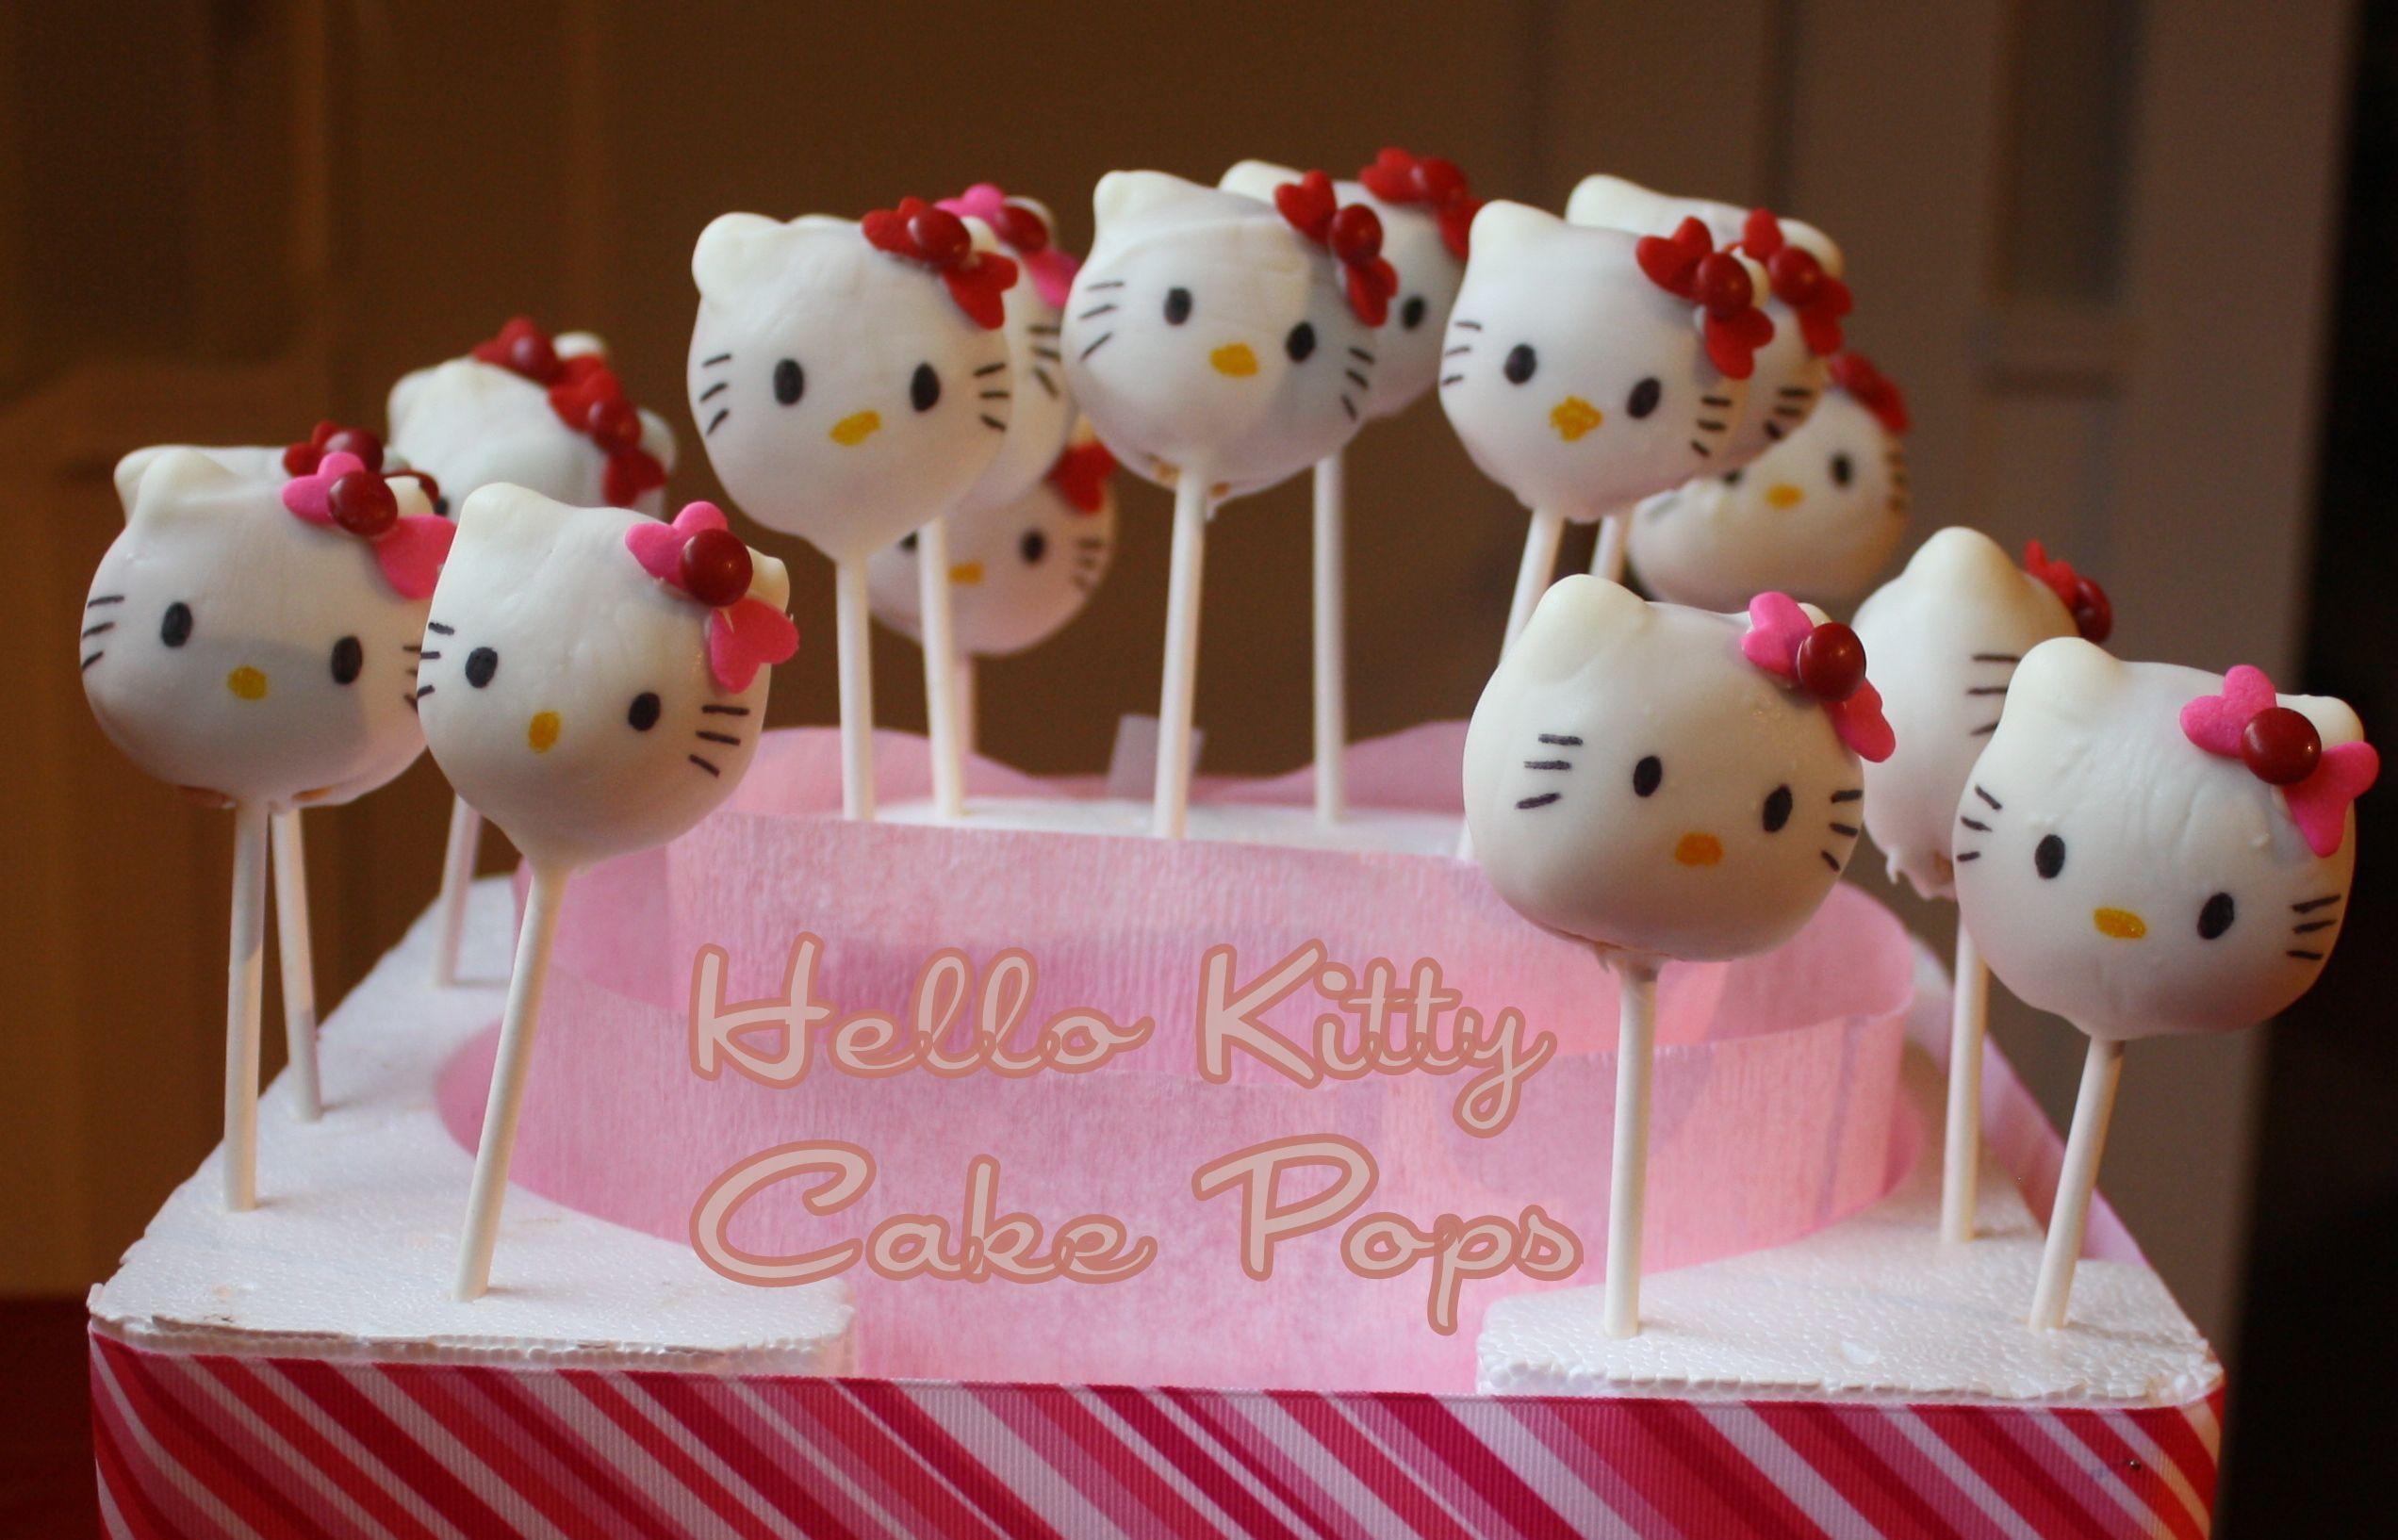 30 Cute Hello Kitty Cake Ideas and Designs Echomoncouk Zoe